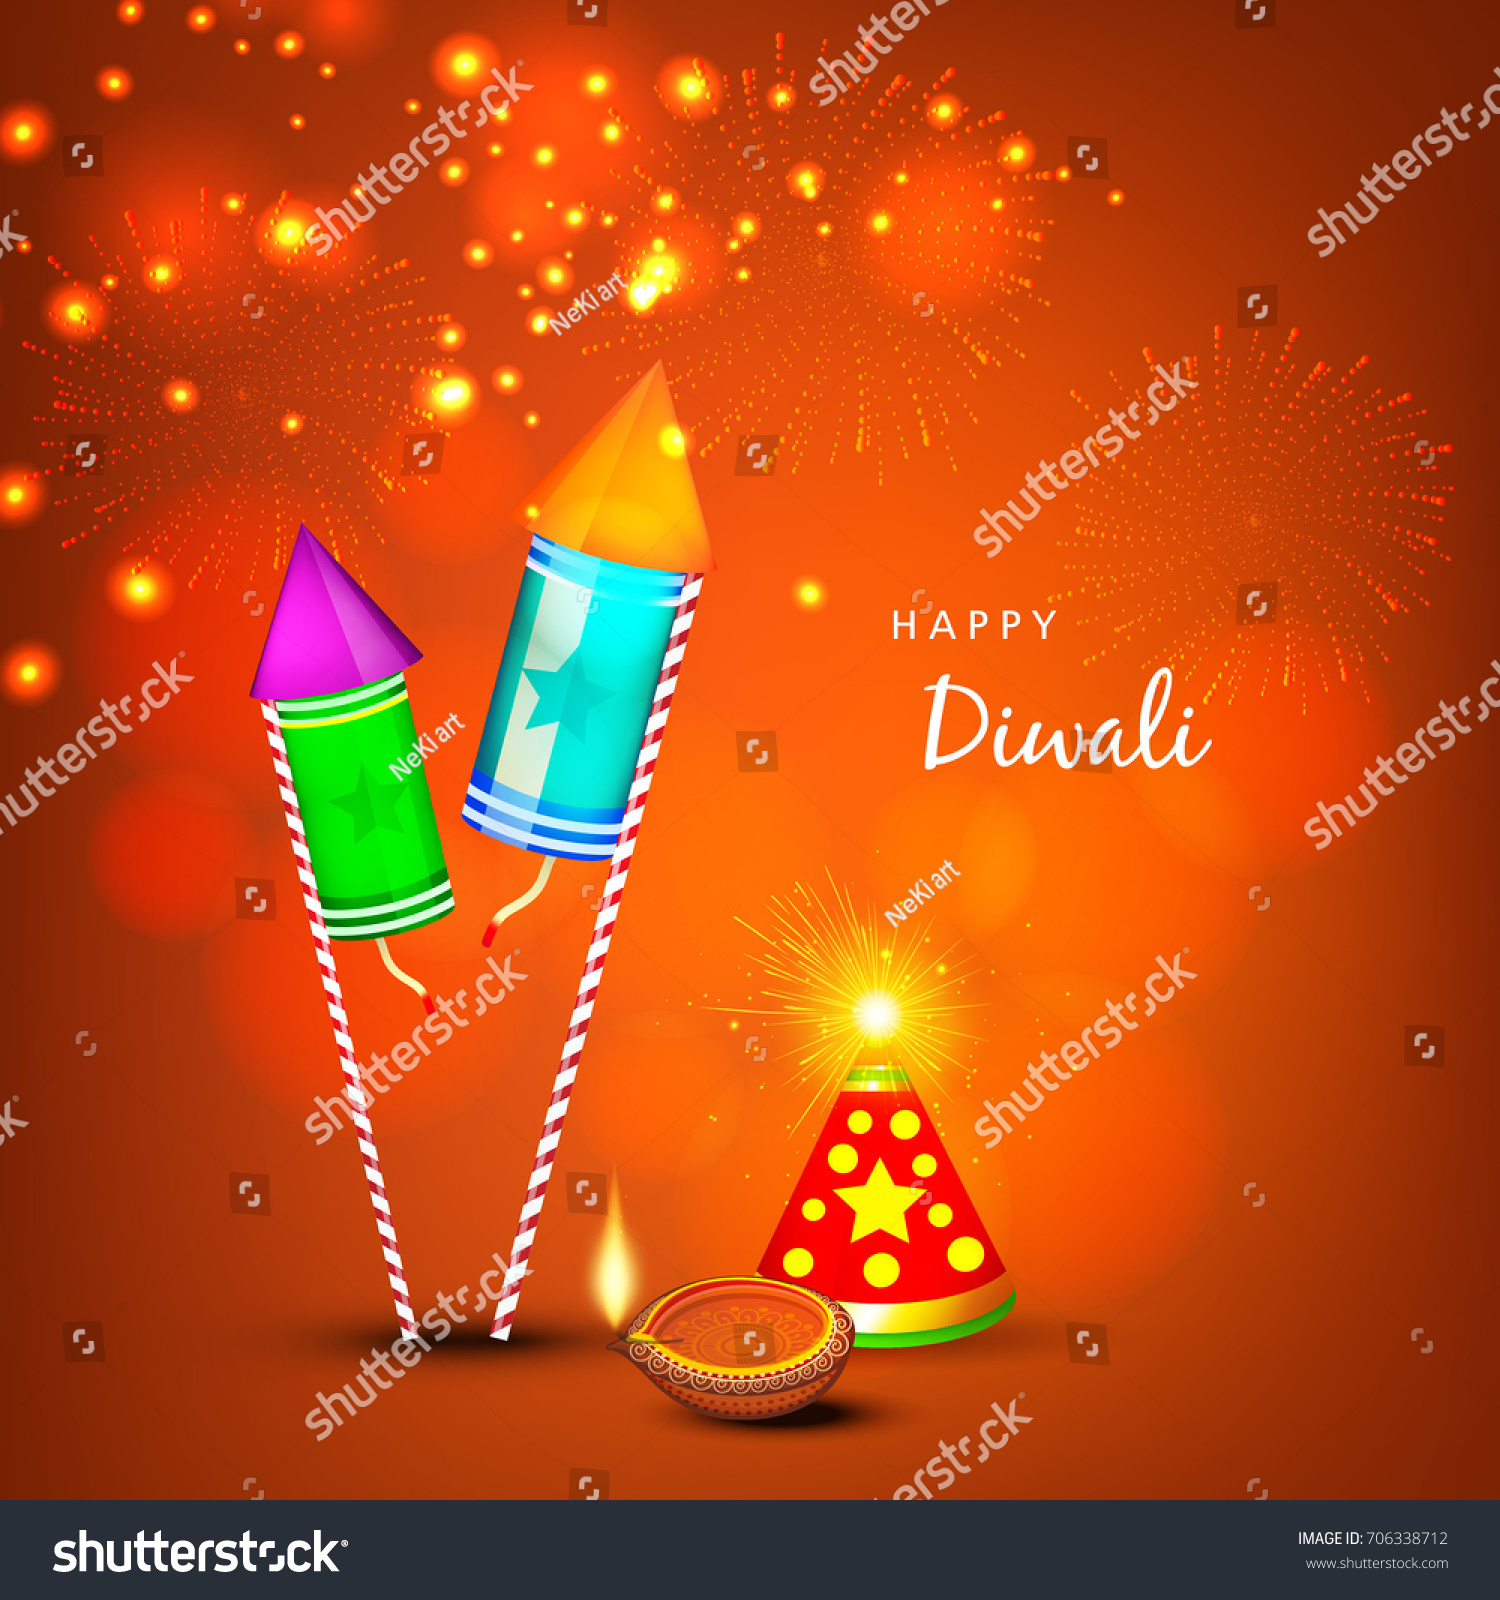 Creative Greeting Card Design Happy Deepavali Stock Vector Royalty